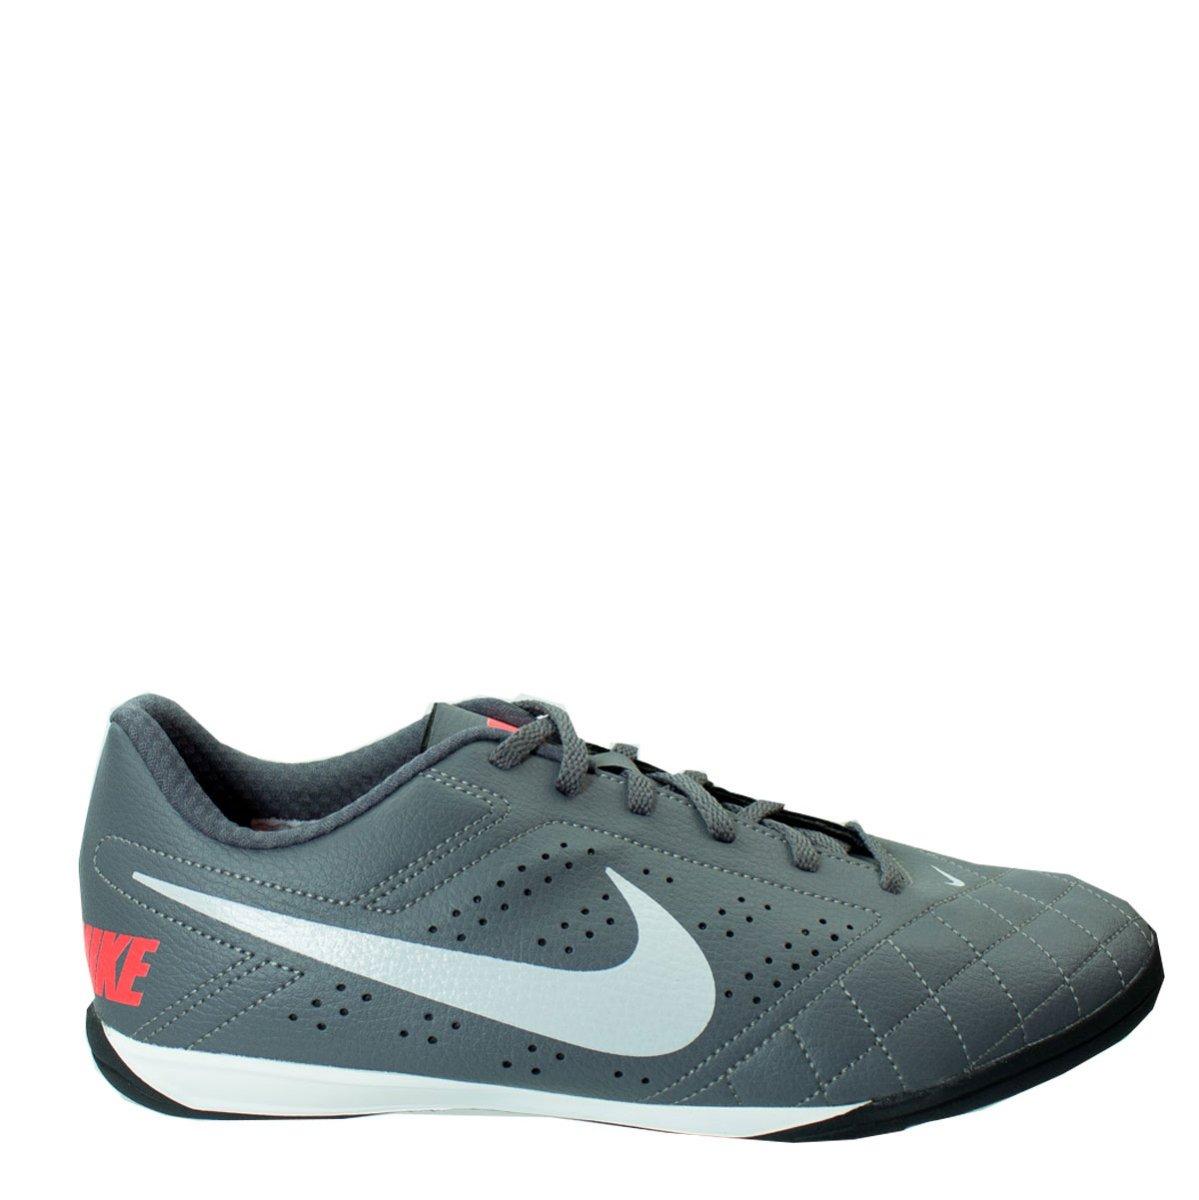 e9c2dbf6902b6 Bizz Store - Chuteira Para Futsal Nike Beco 2 Masculina 646433